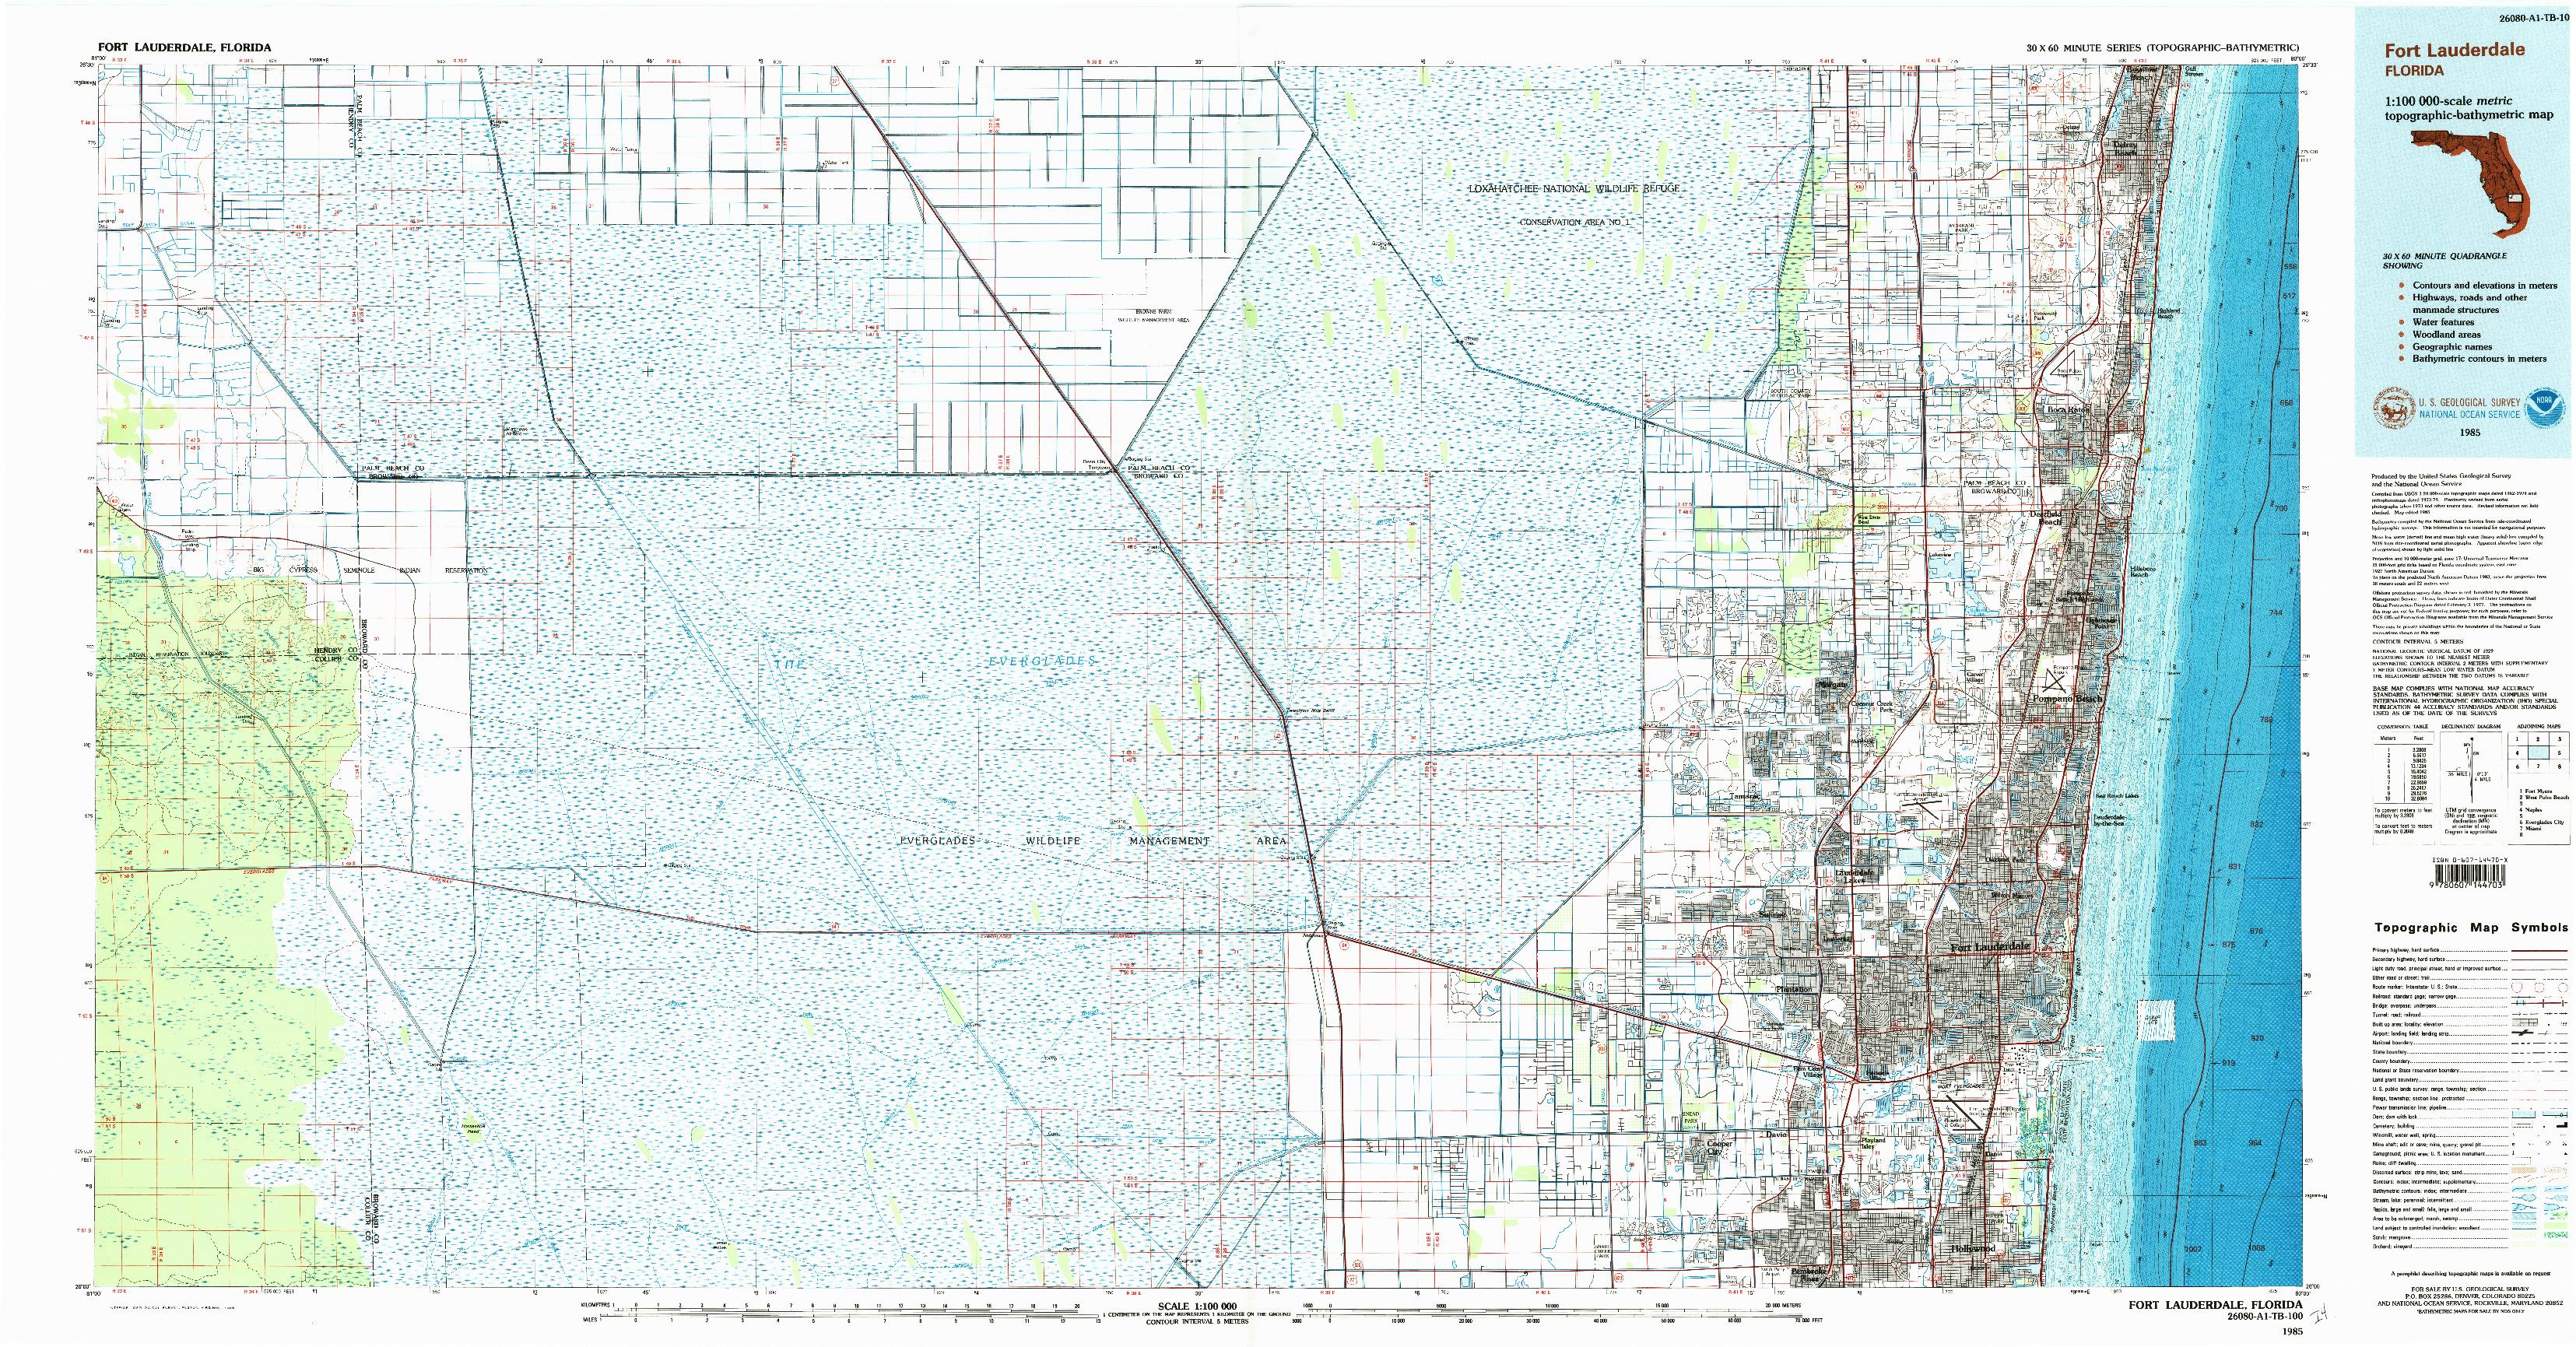 USGS 1:100000-SCALE QUADRANGLE FOR FORT LAUDERDALE, FL 1985